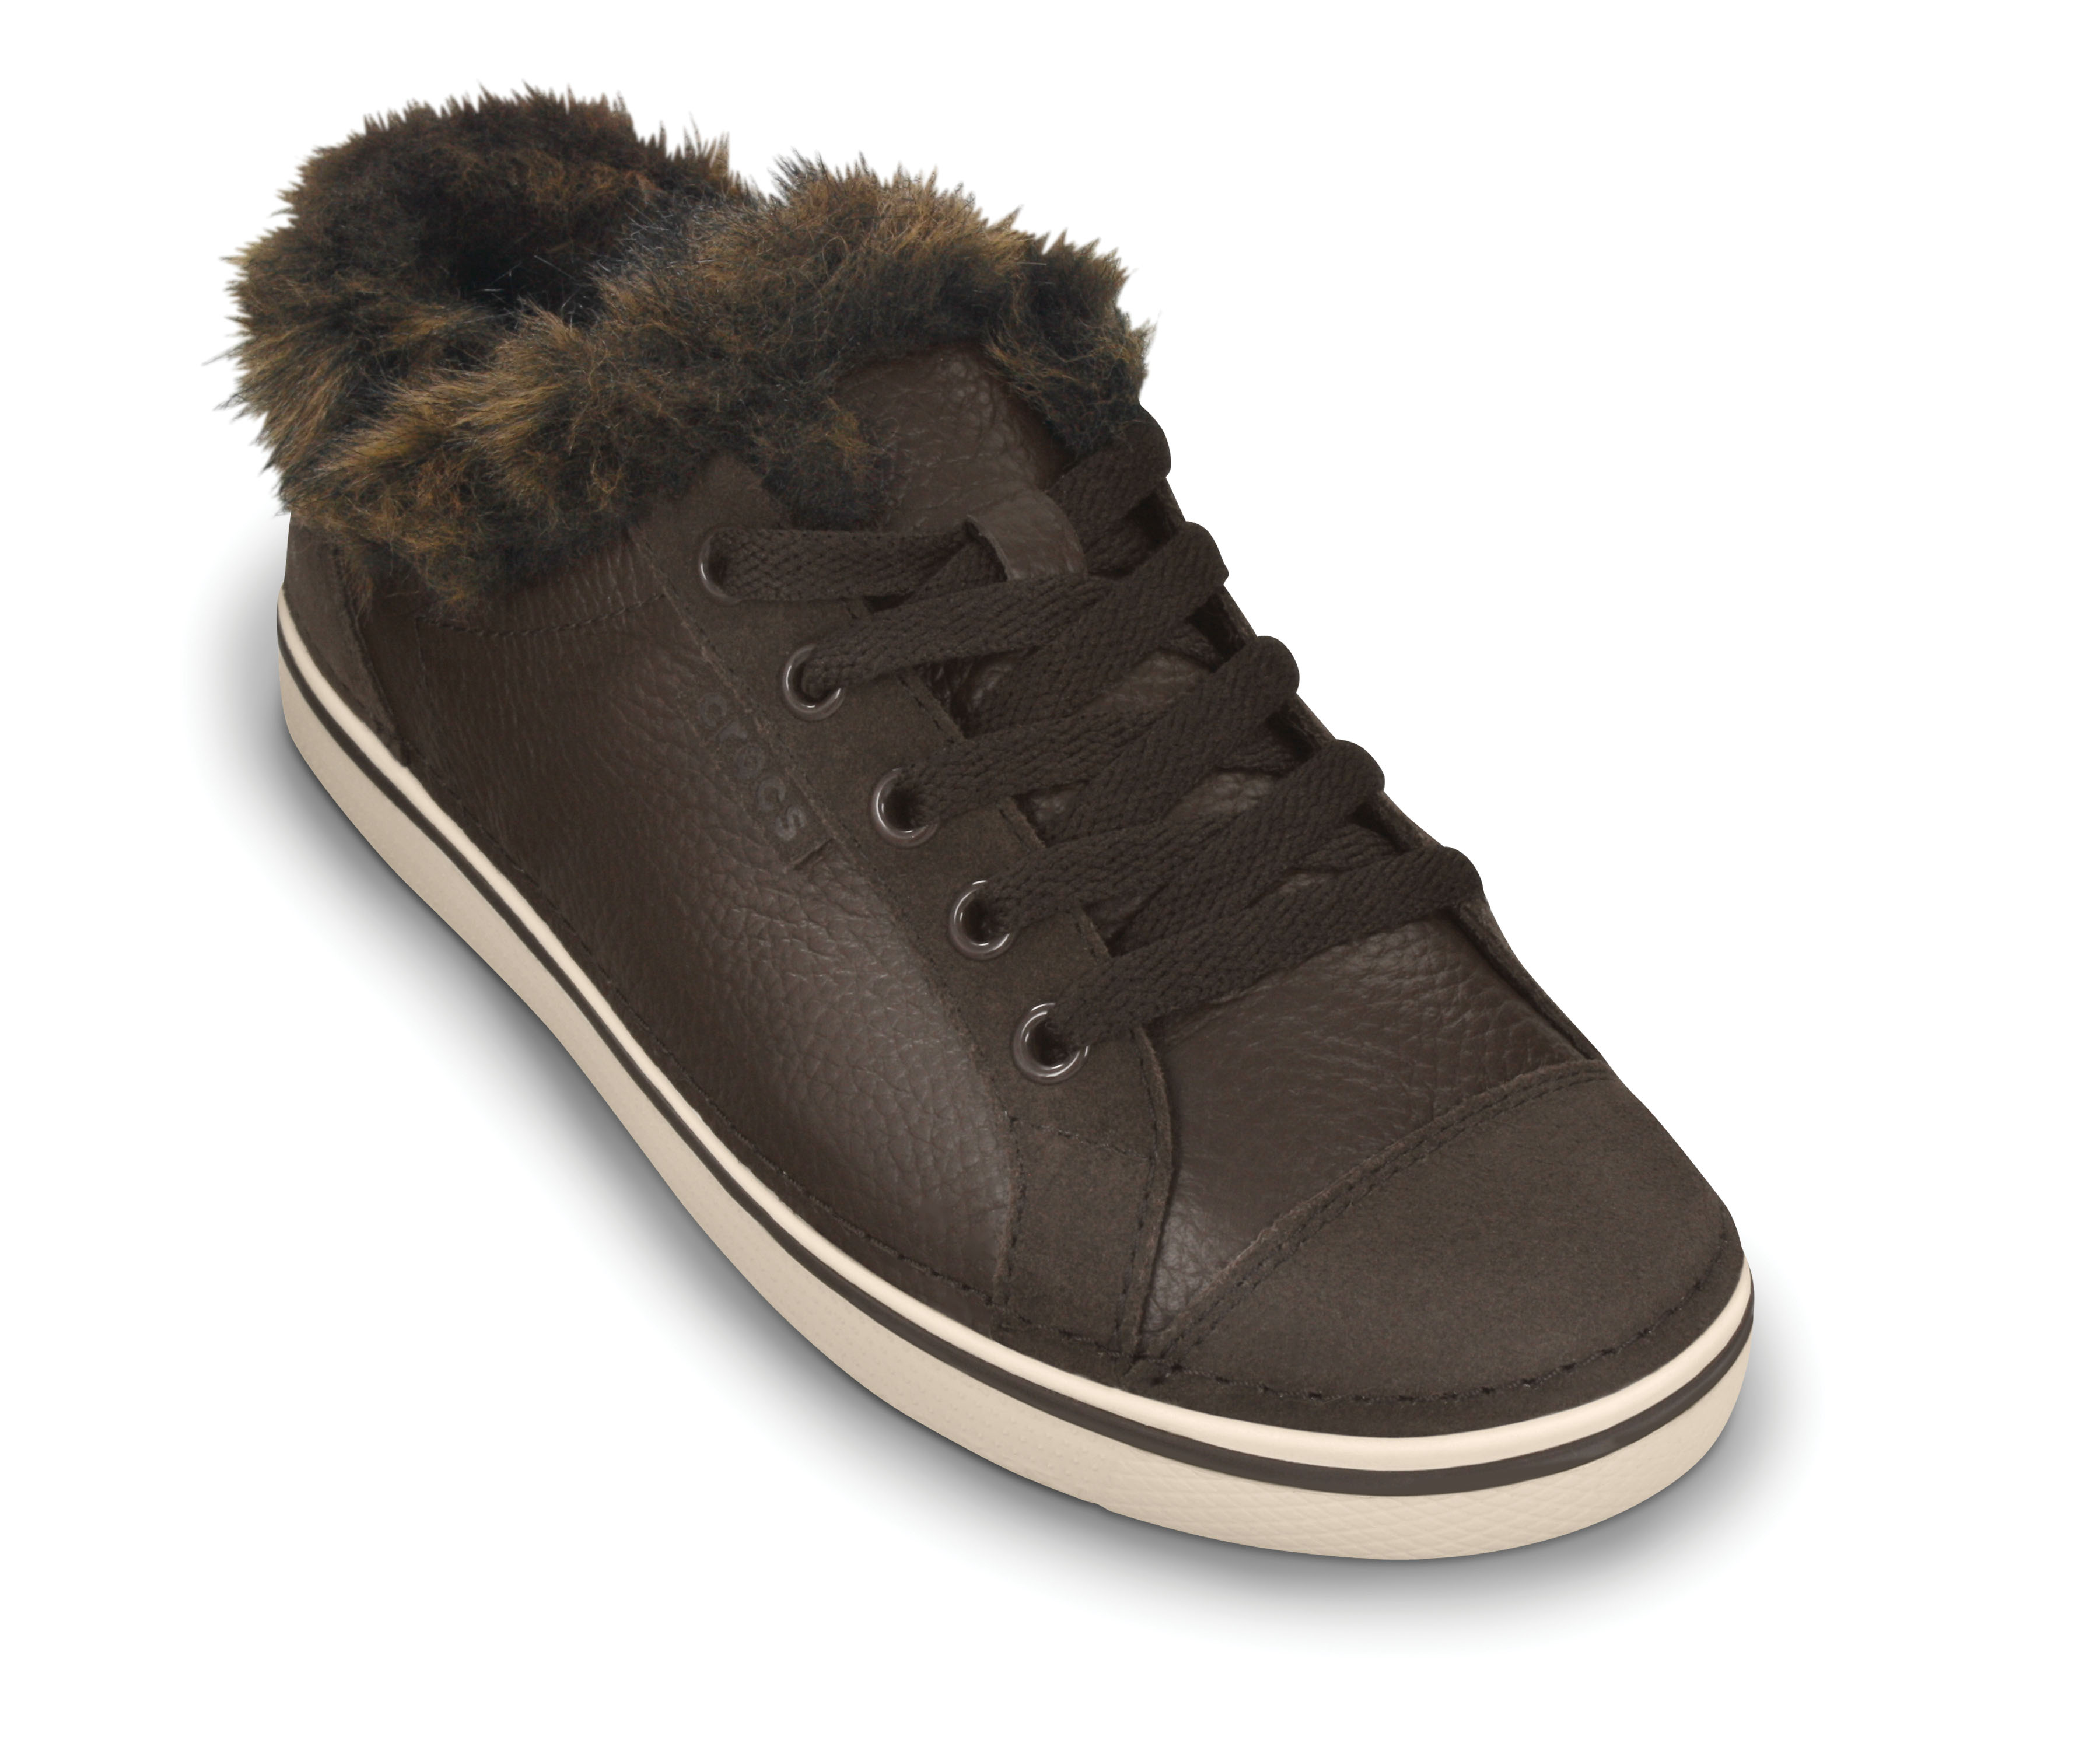 Crocs Hover Sneak Fur Girls - Espresso/Stucco - W5